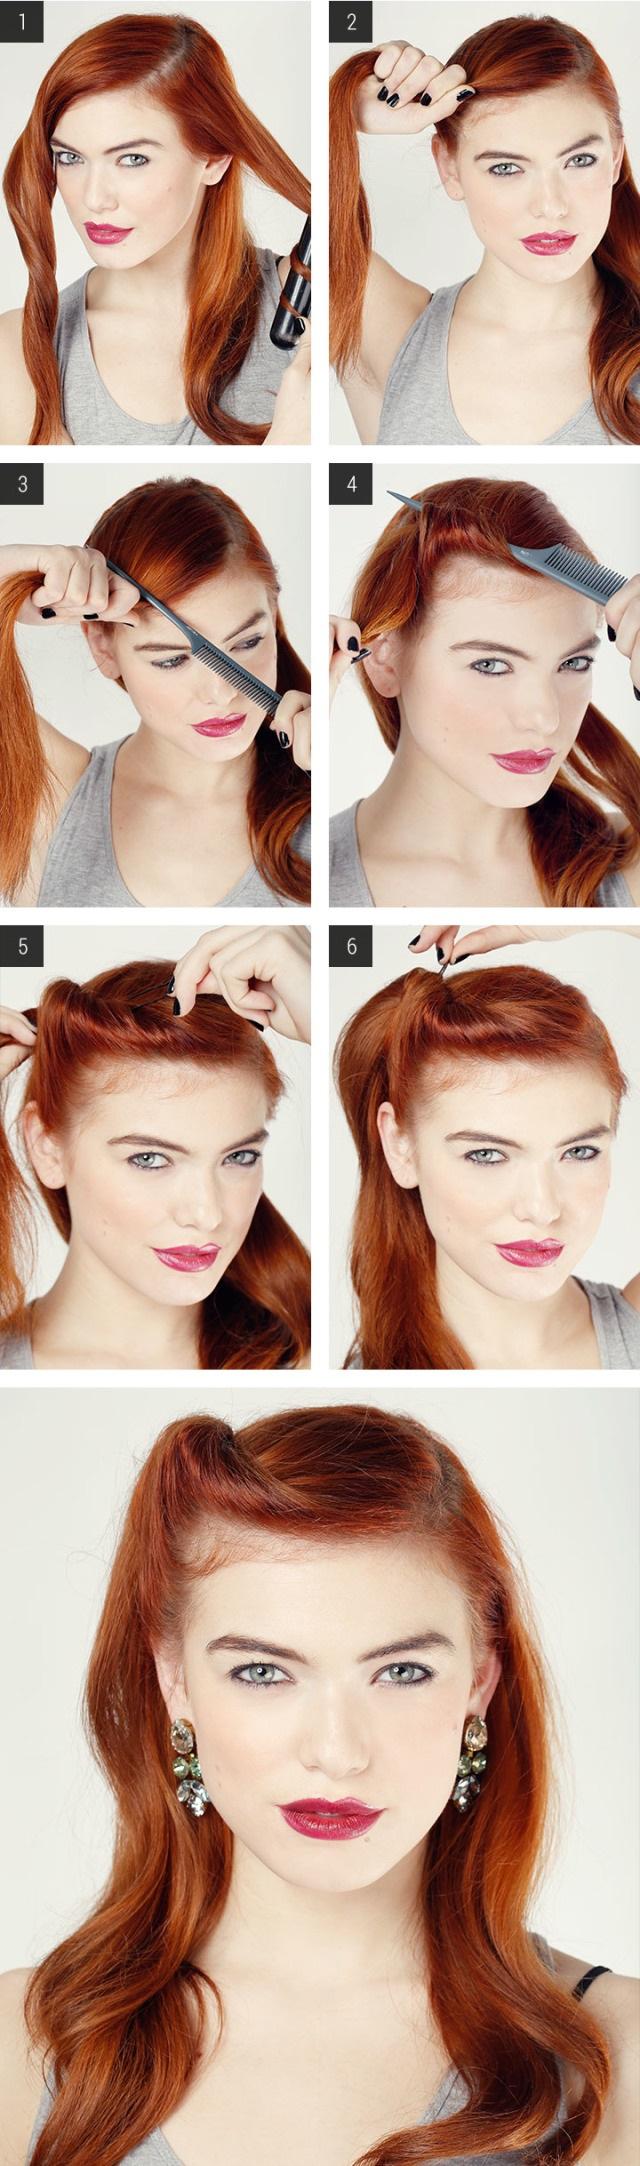 17 ways to make vintage hairstyles | avalon school of